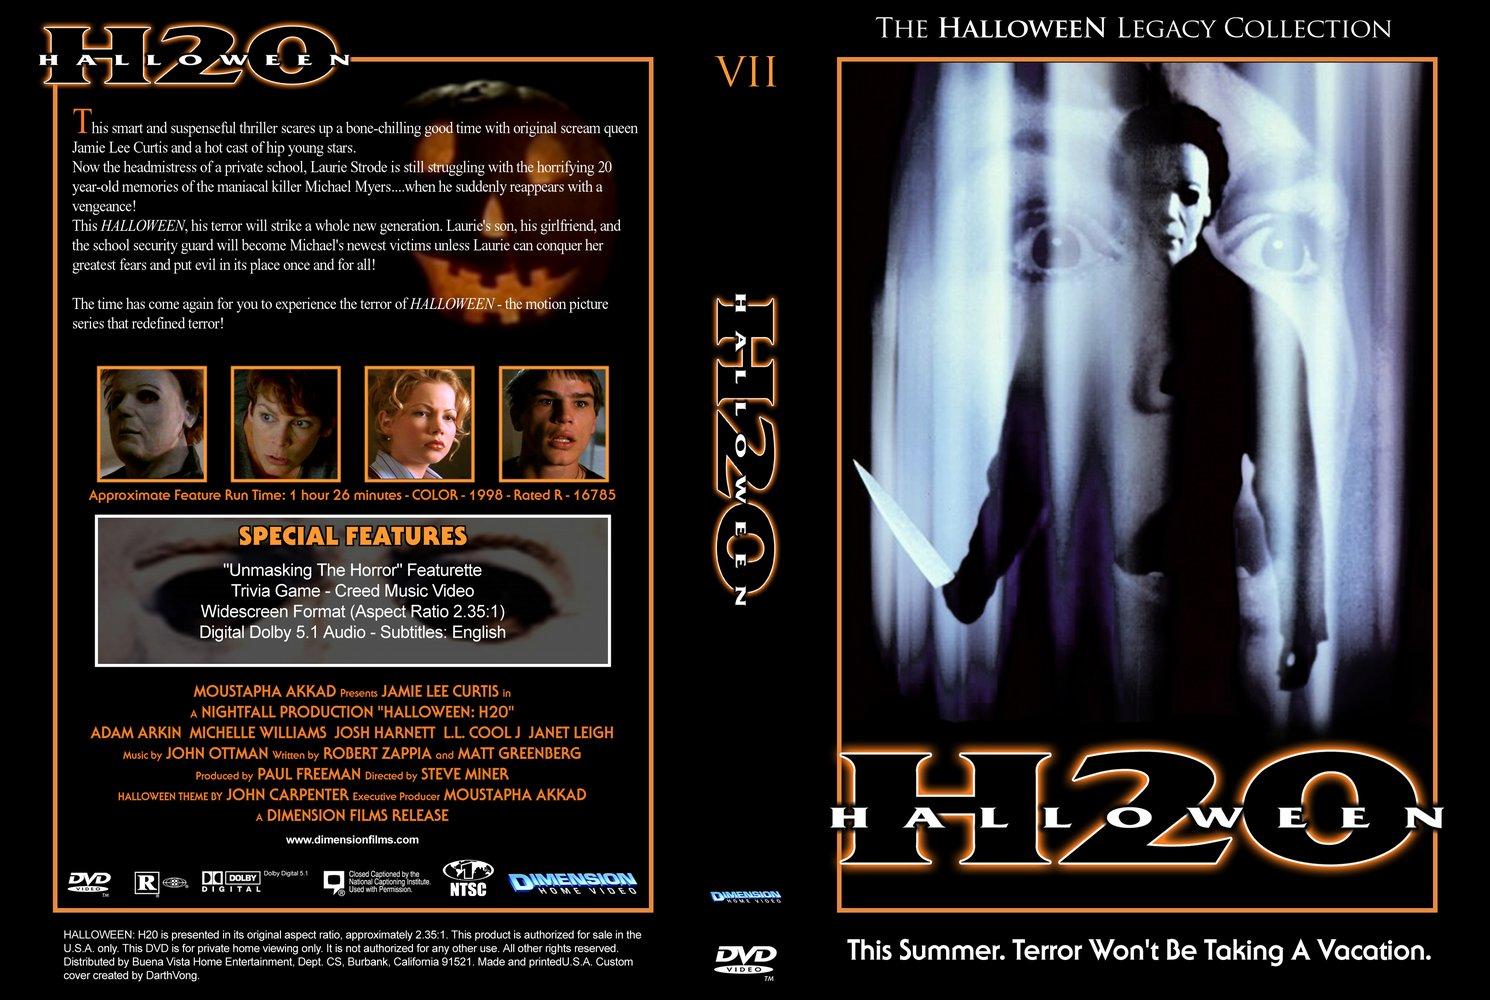 australian dvd cover - Halloween H20 Theme